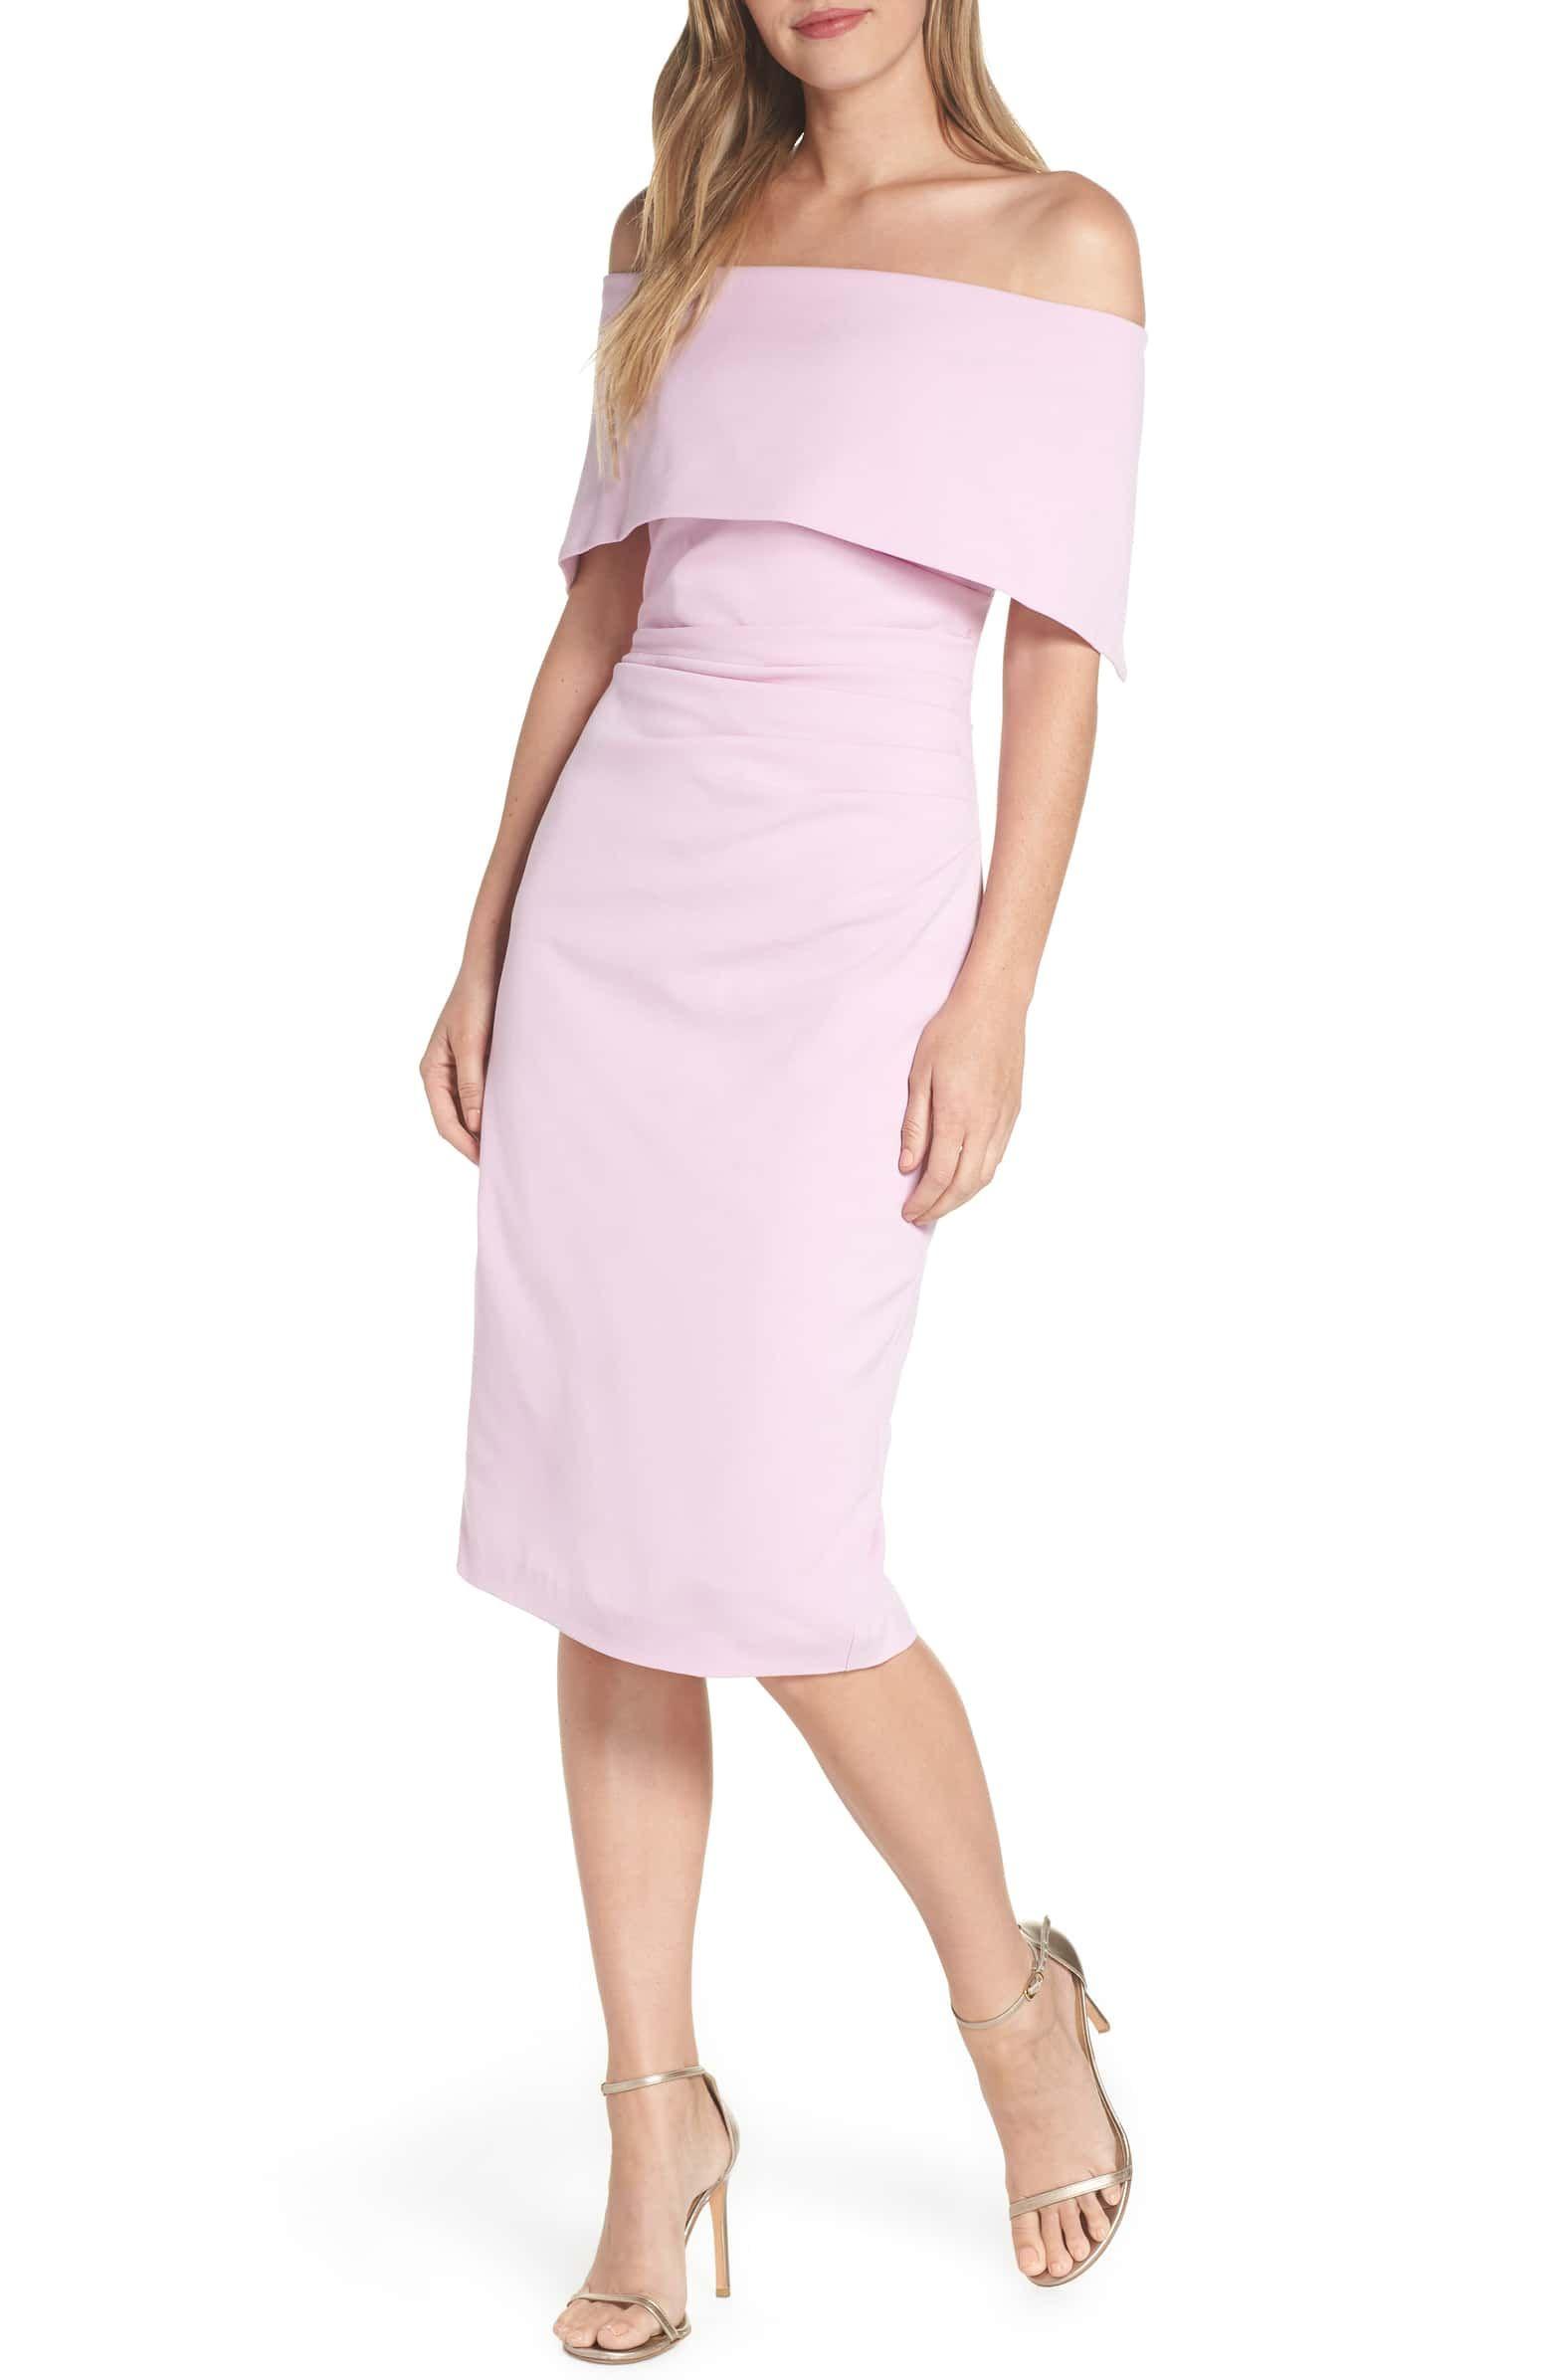 Vince Camuto Popover Cocktail Dress Regular Petite Nordstrom Dresses Fashion Clothes Women Womens Purple Dresses [ 2392 x 1560 Pixel ]